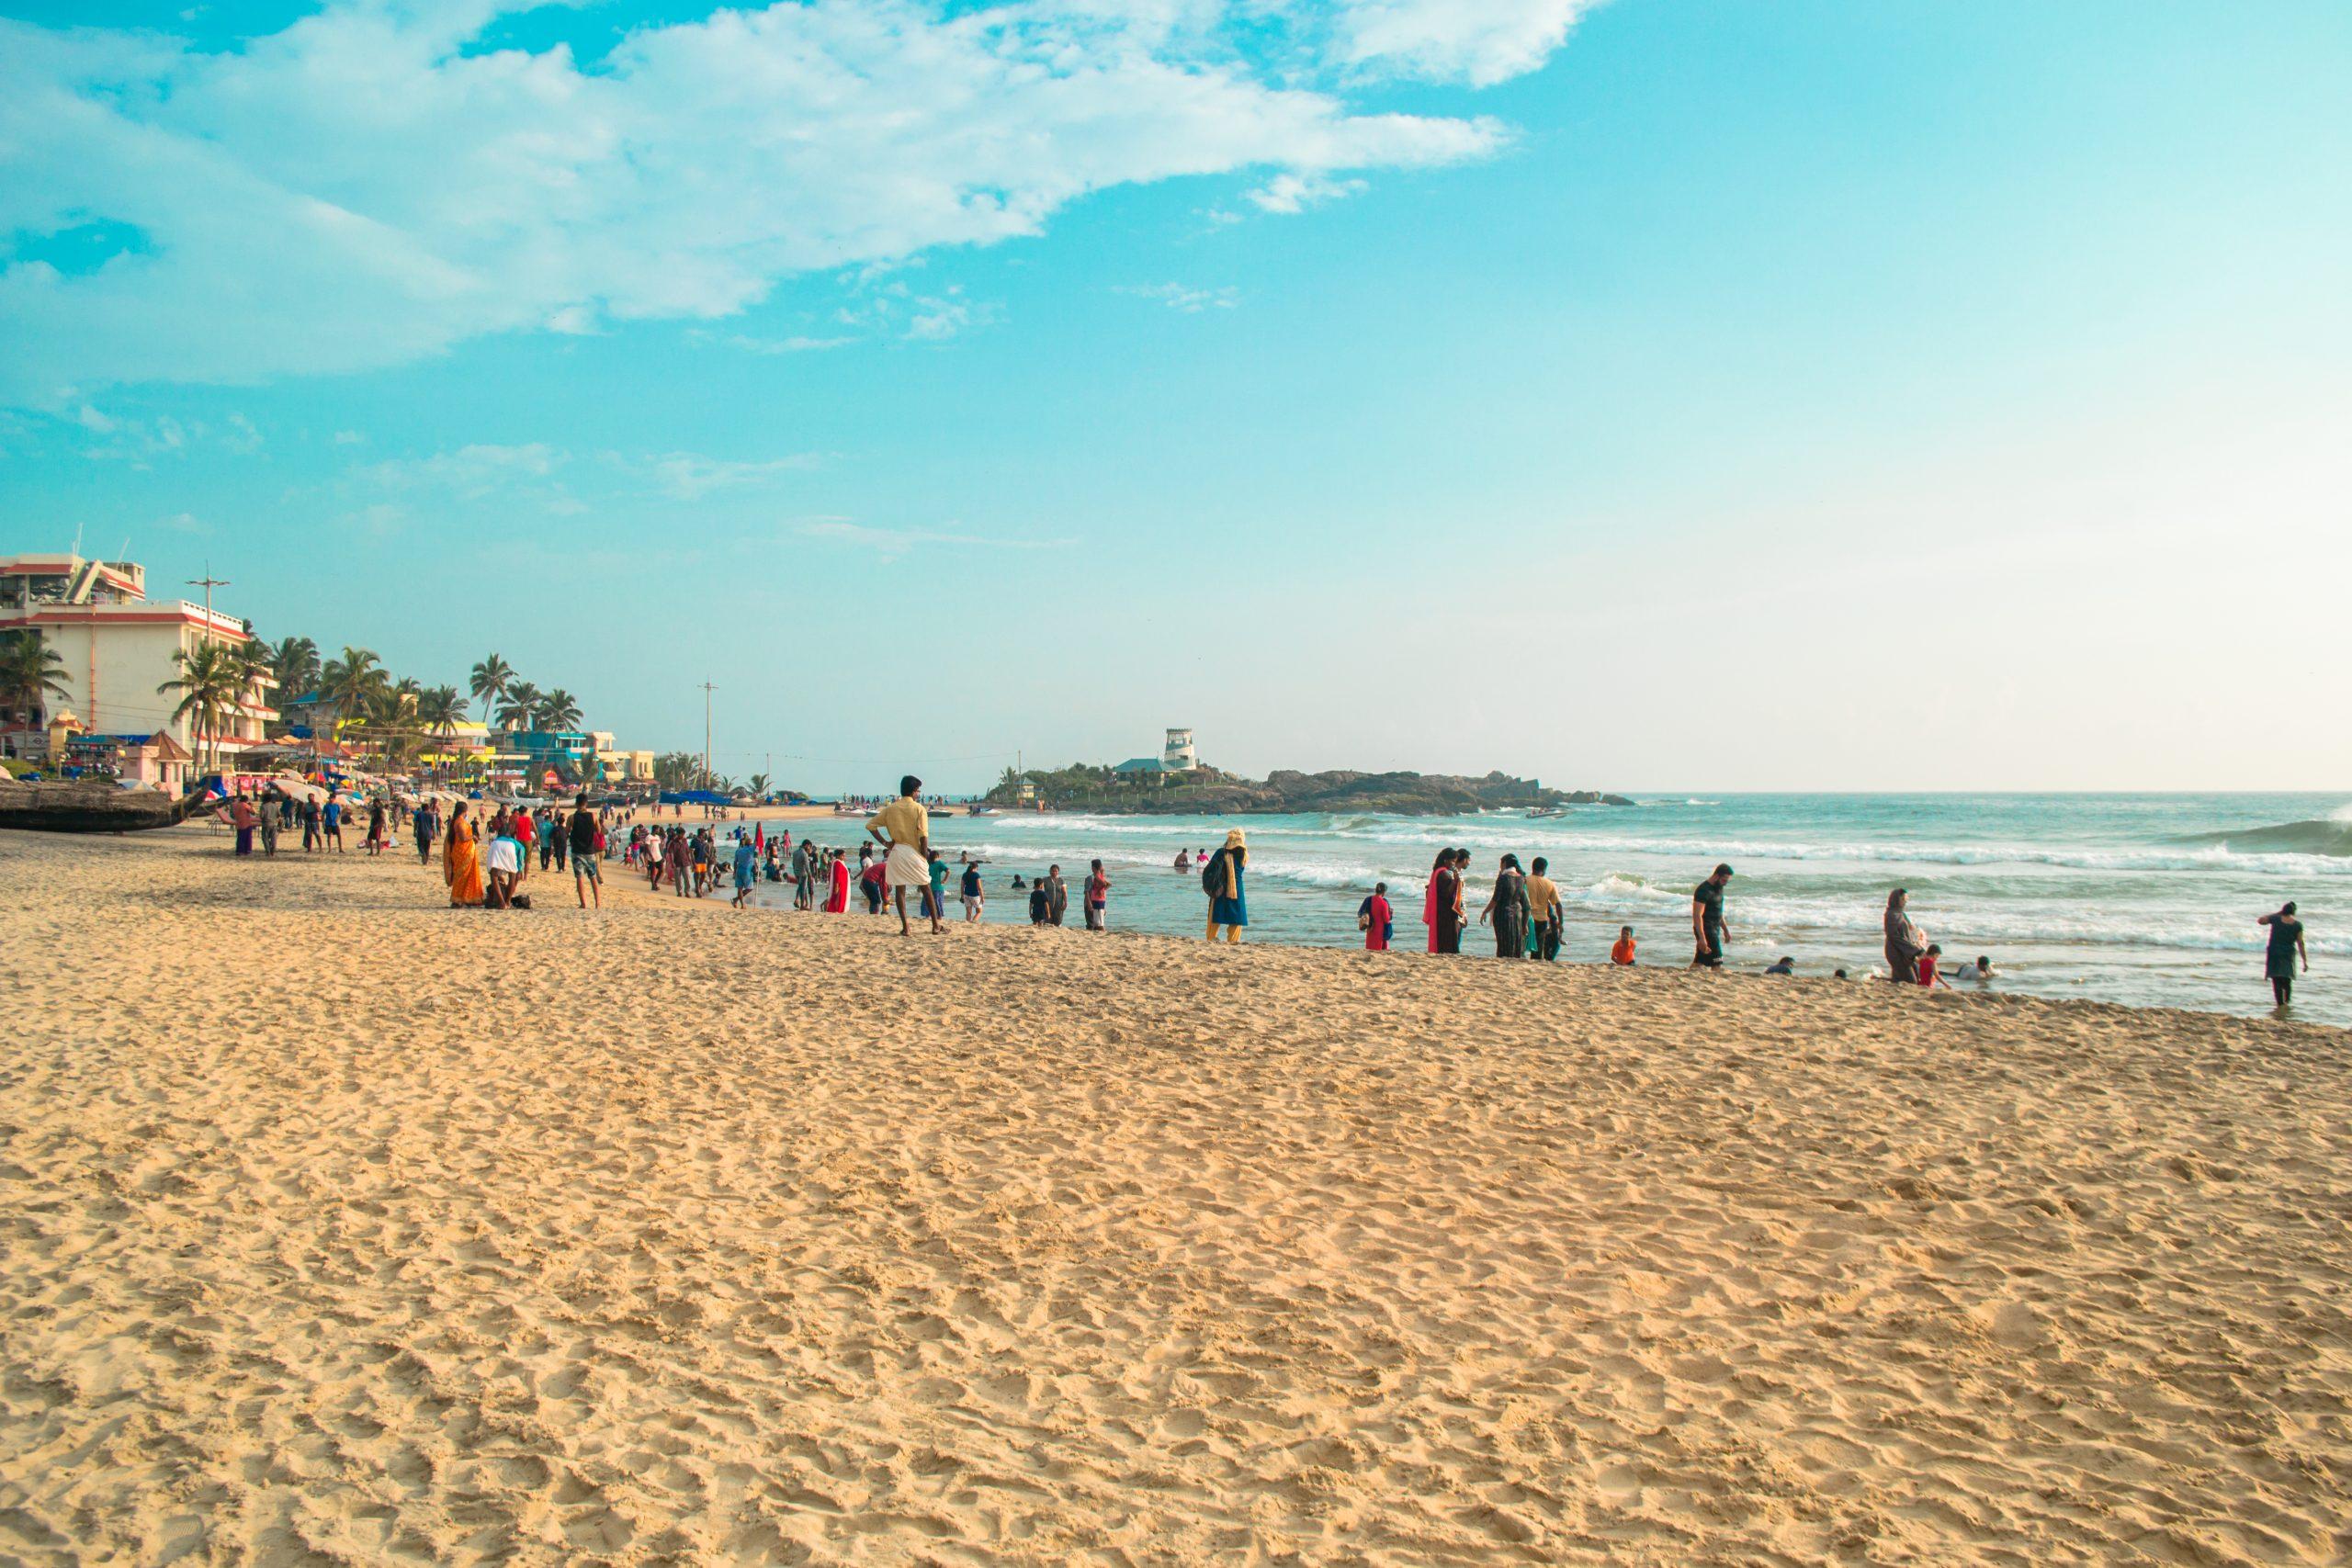 People at Kovalam beach